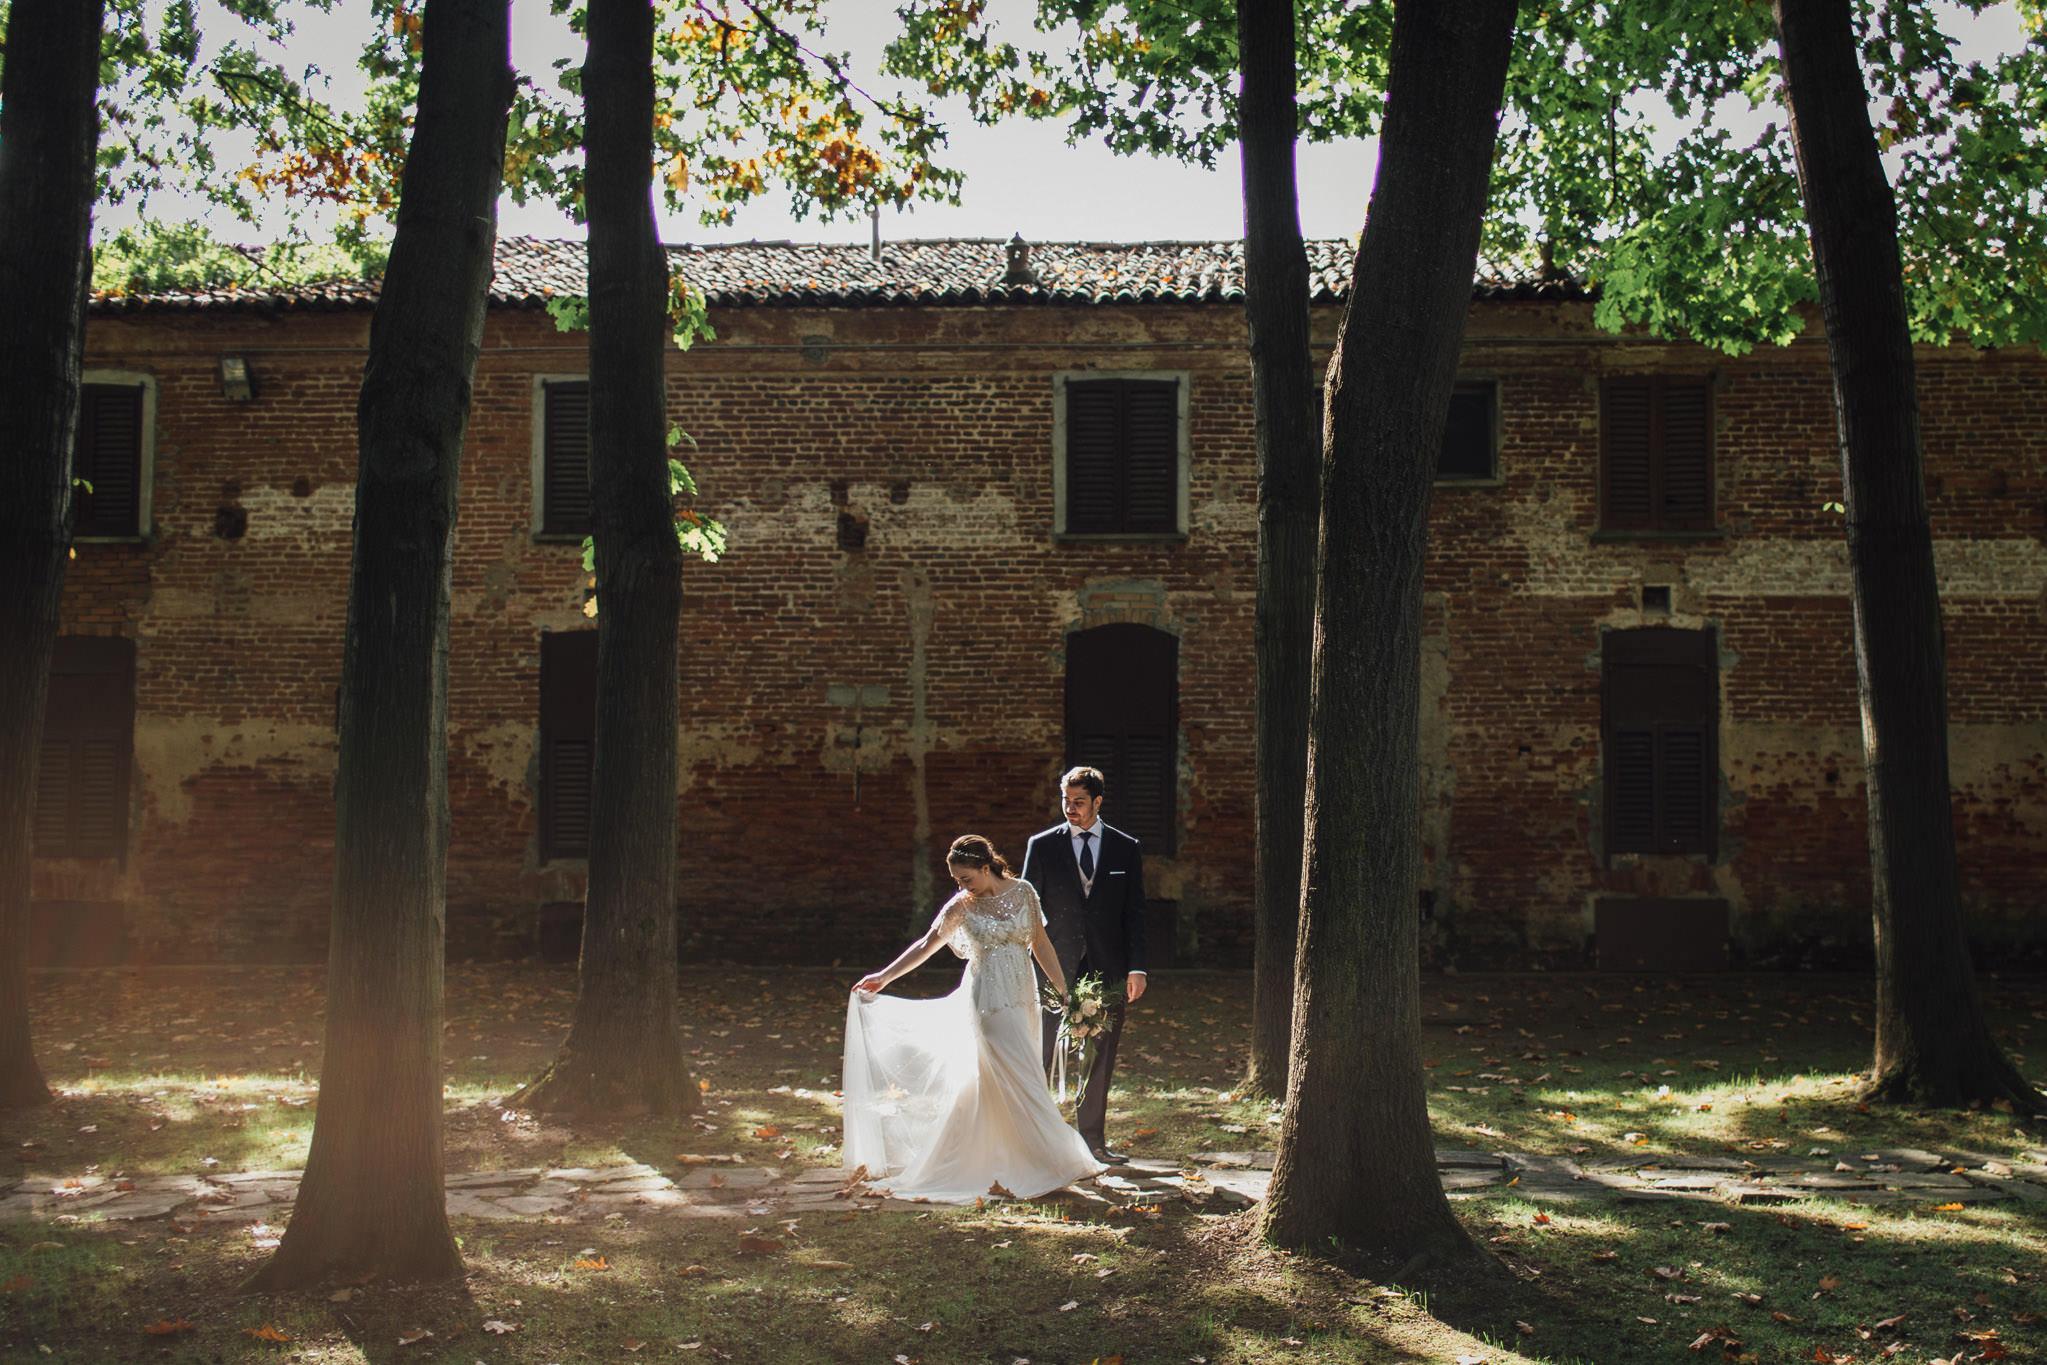 fotografia_di_matrimonio_portfolio-1005